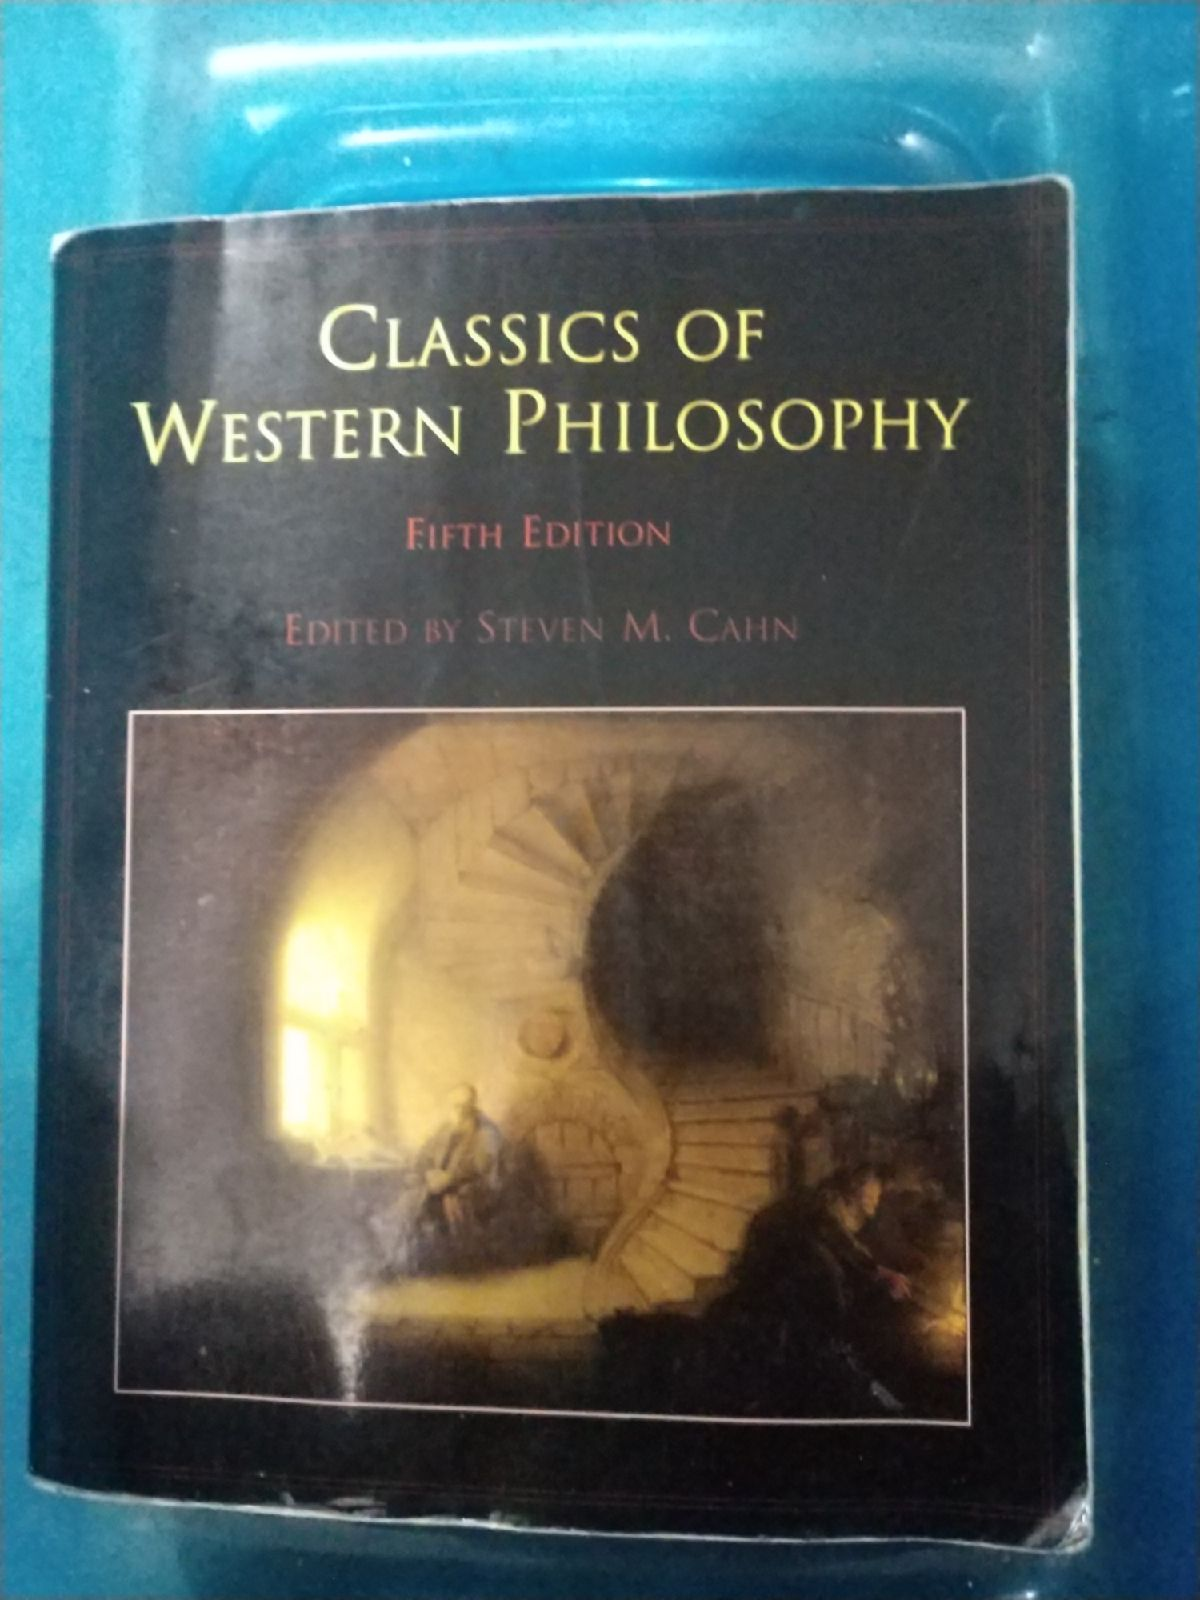 Classics of Western philosophy 5th editi